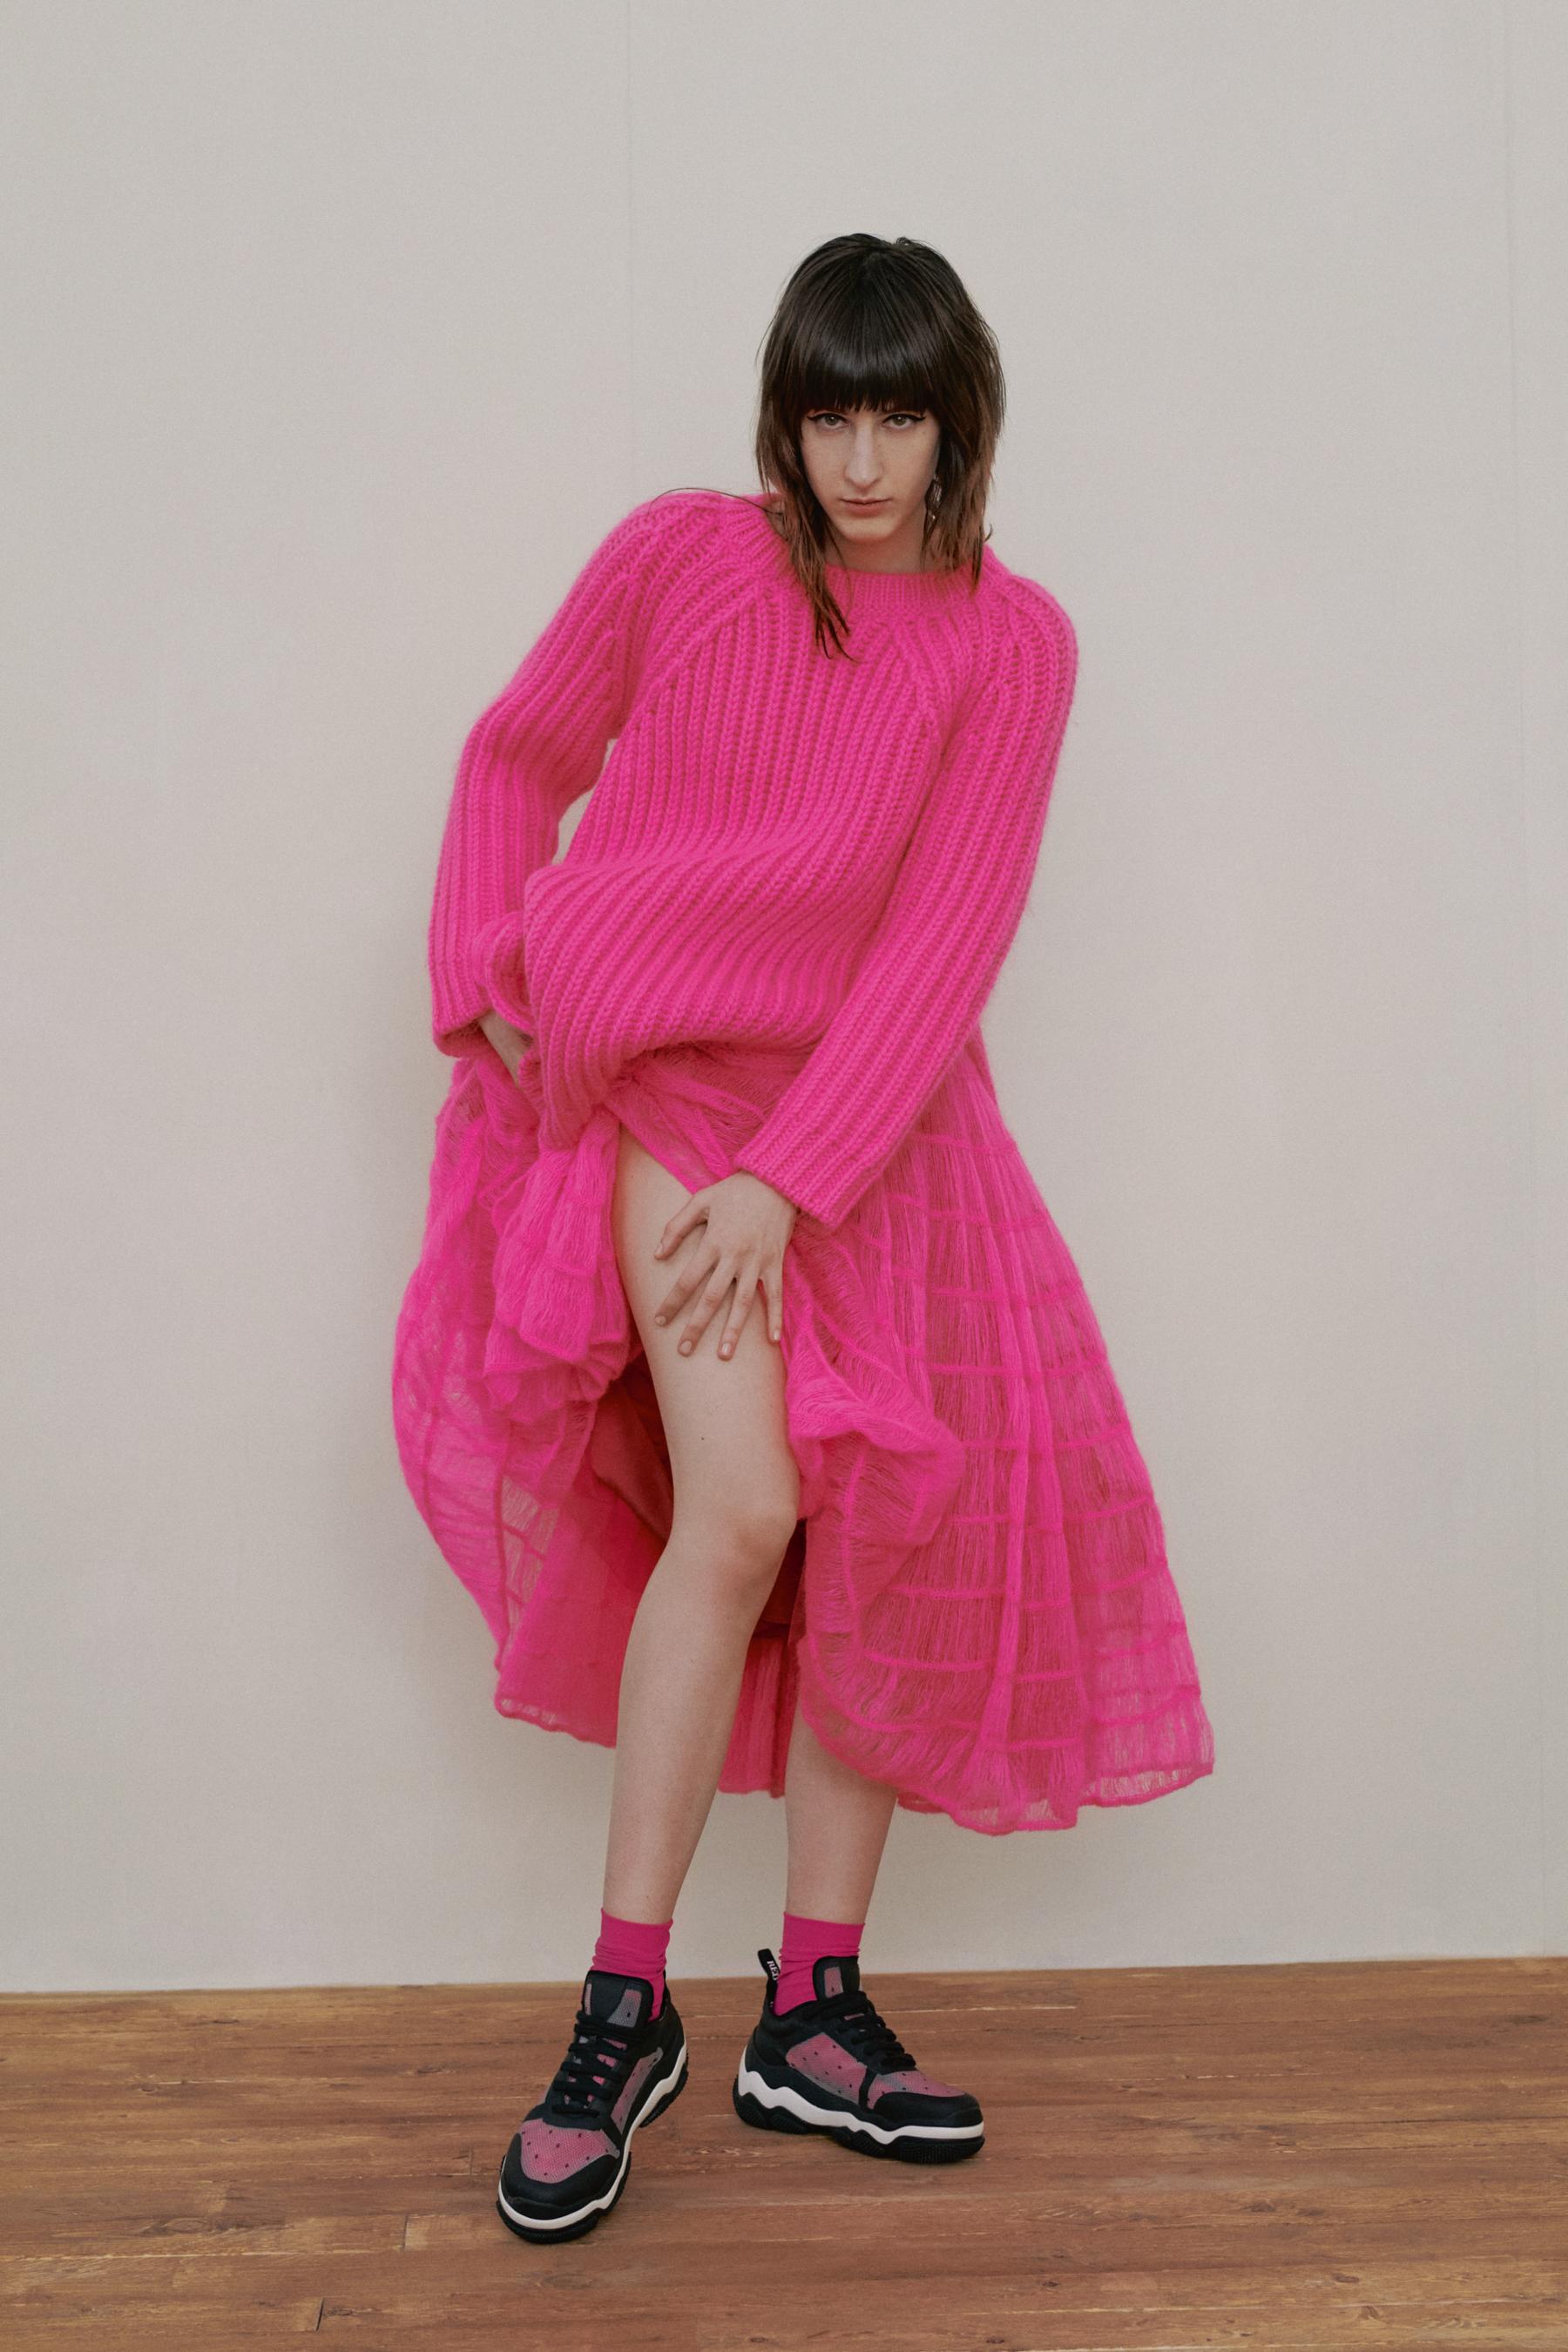 Red Valentino Fall 2021 Fashion Show